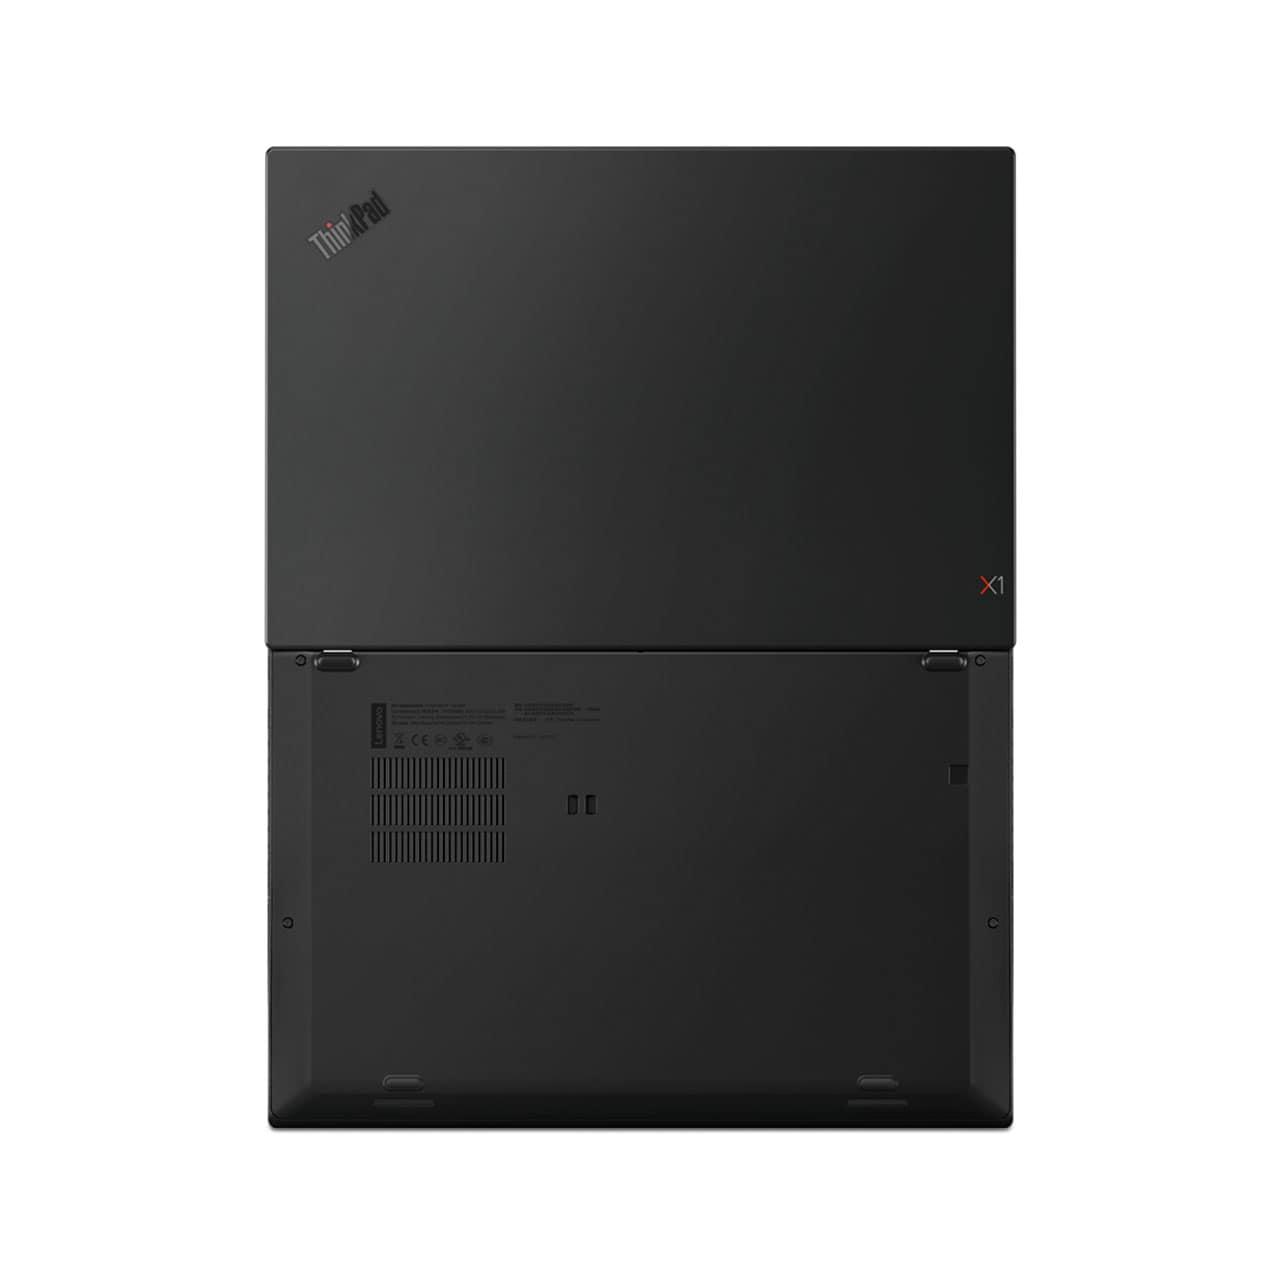 "Lenovo ThinkPad X1 Carbon 6th Generation, 14.0"", i7-8650U, 16 GB RAM, 512GB SSD, Win 10 Pro 64 4"